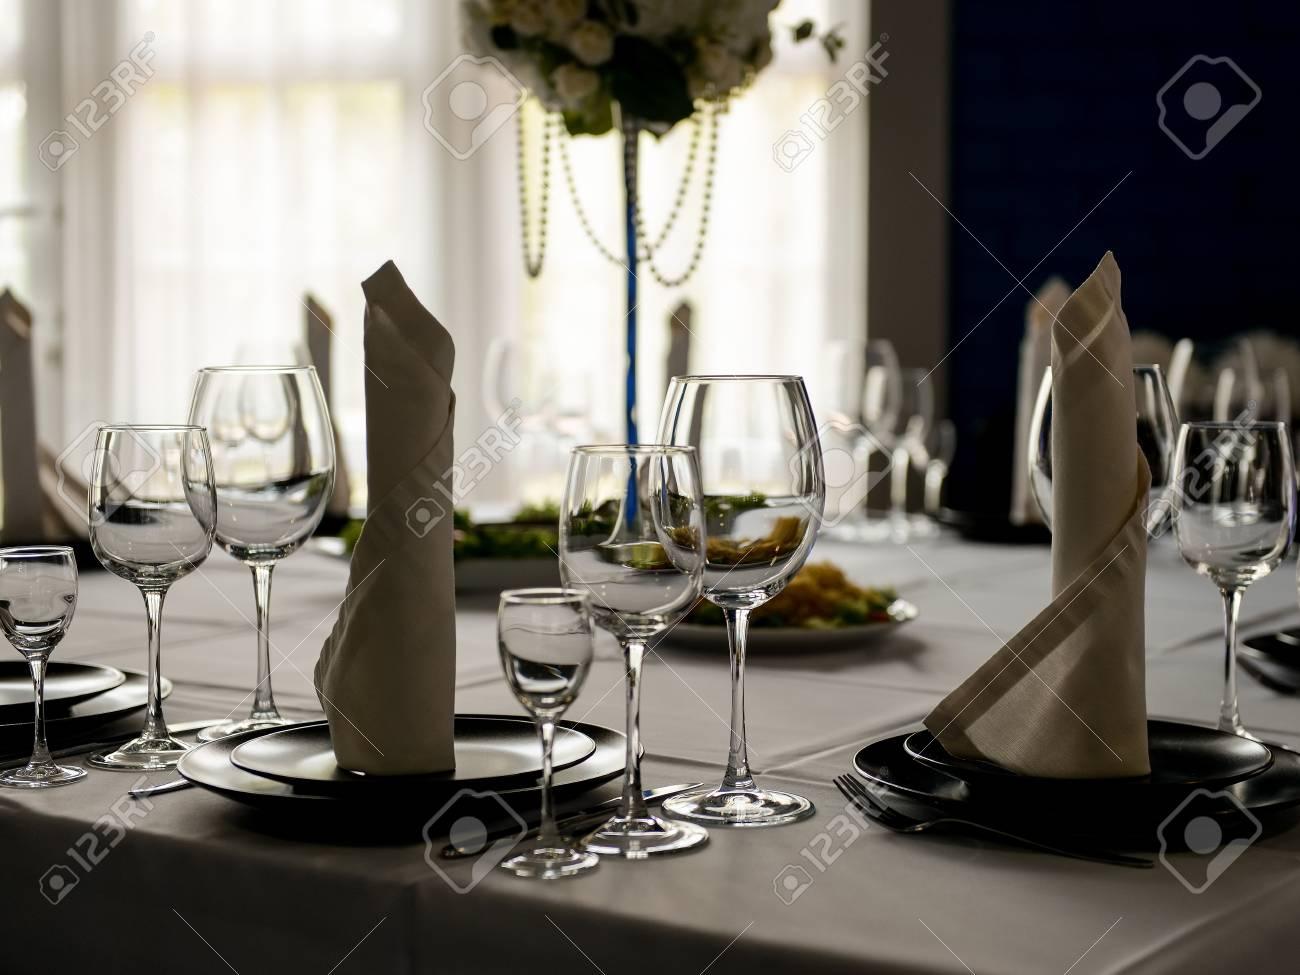 Beautiful interior of restaurant ready for wedding celebration - 117134955